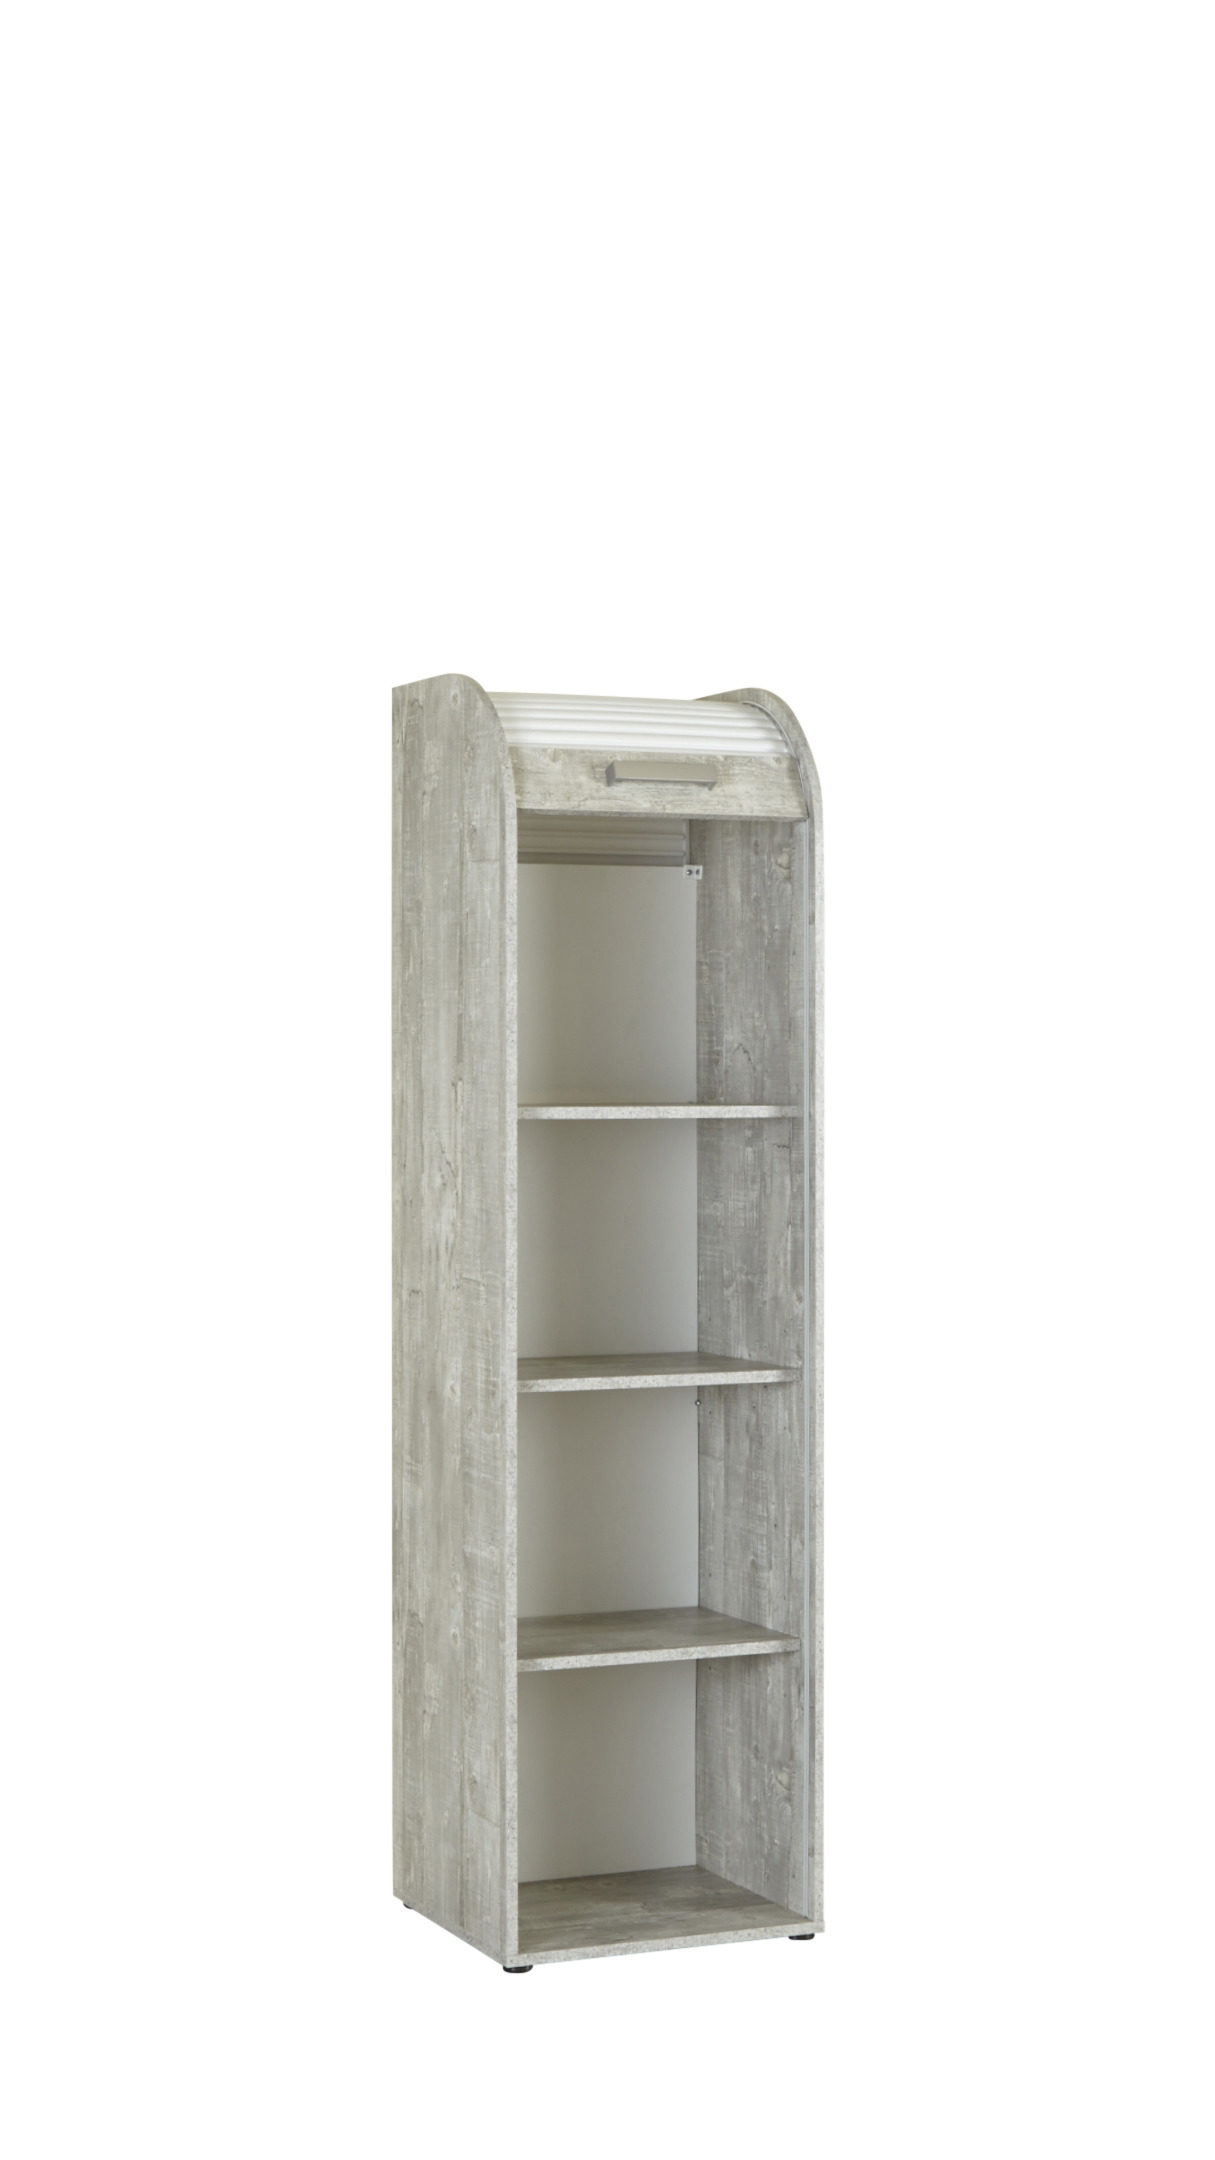 Erfreut Toptec Büromöbel Galerie - Innenarchitektur-Kollektion ...